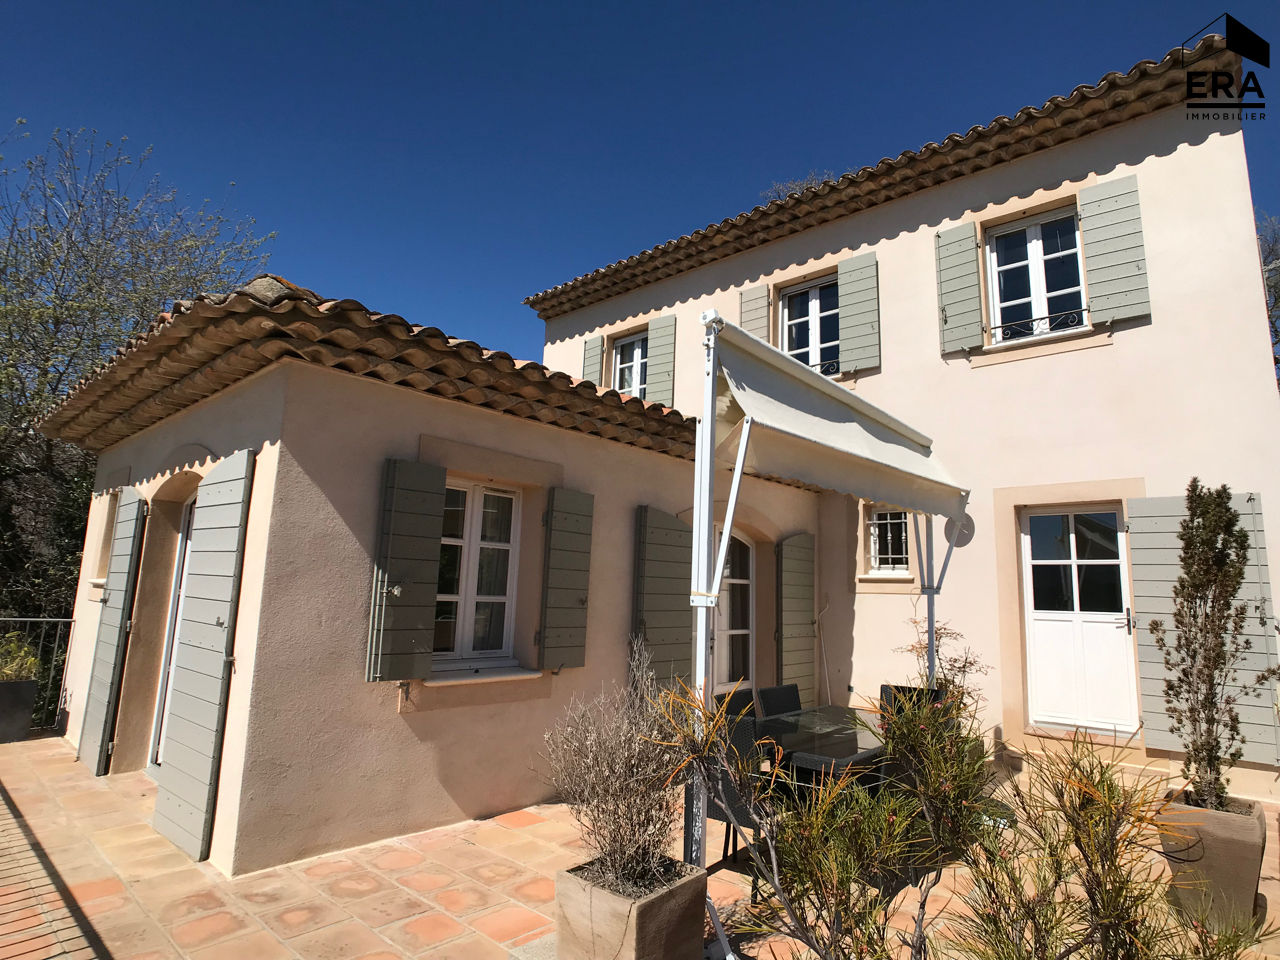 villa 4 chambres avec piscine et grande terrasse couverte saint paul en for t 83440. Black Bedroom Furniture Sets. Home Design Ideas